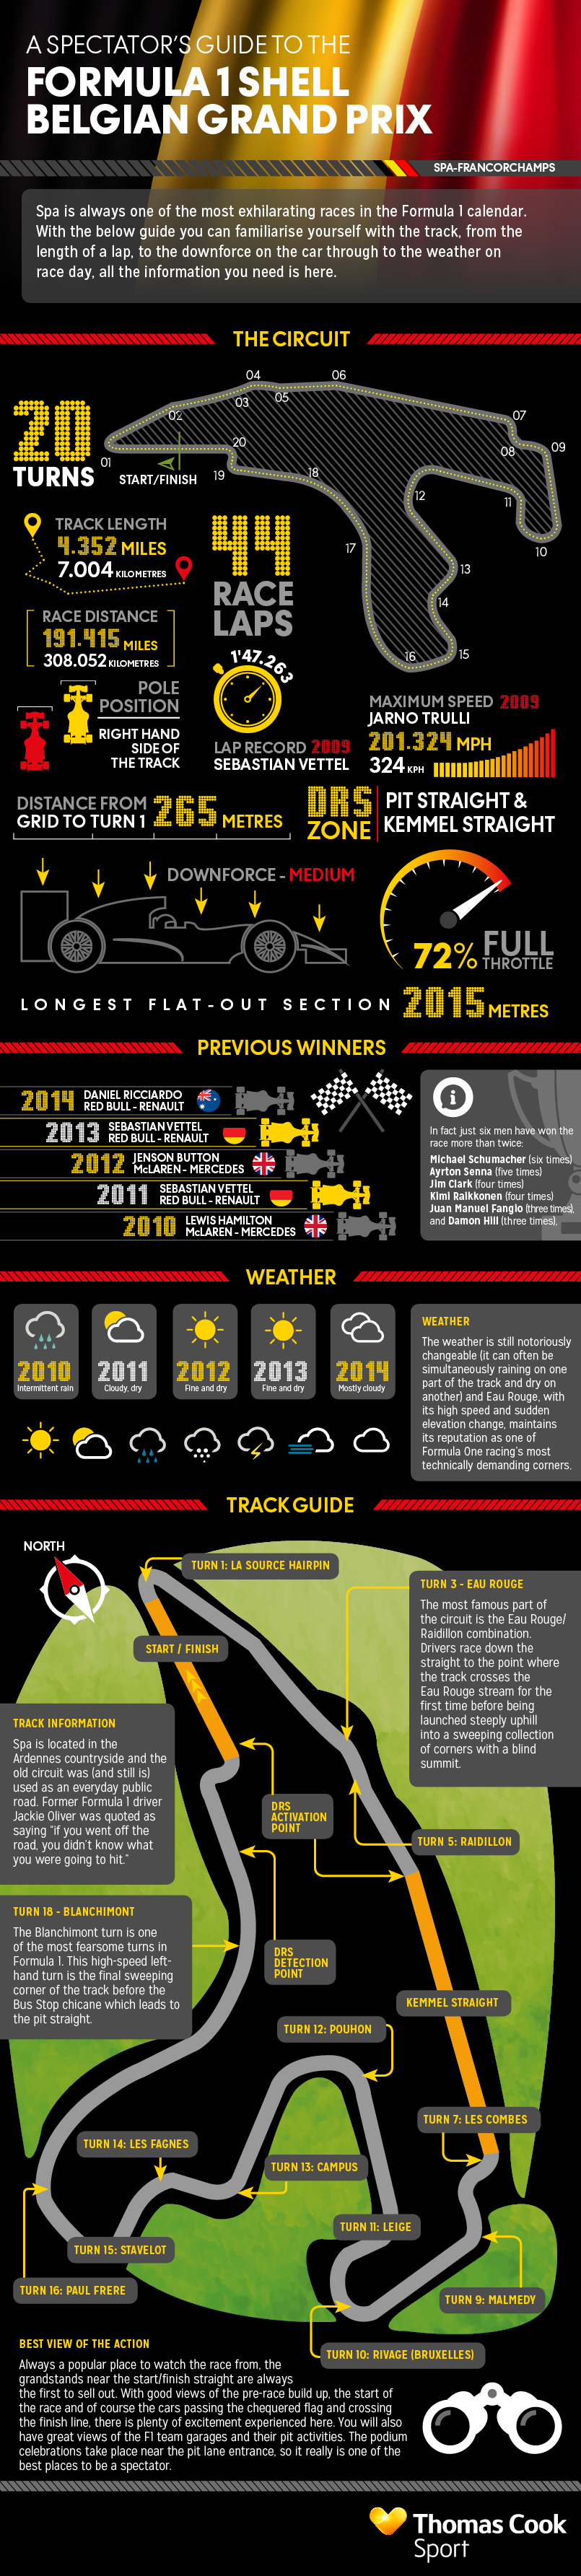 The Spectators Guide to the Formula 1 Belgium Grand Prix